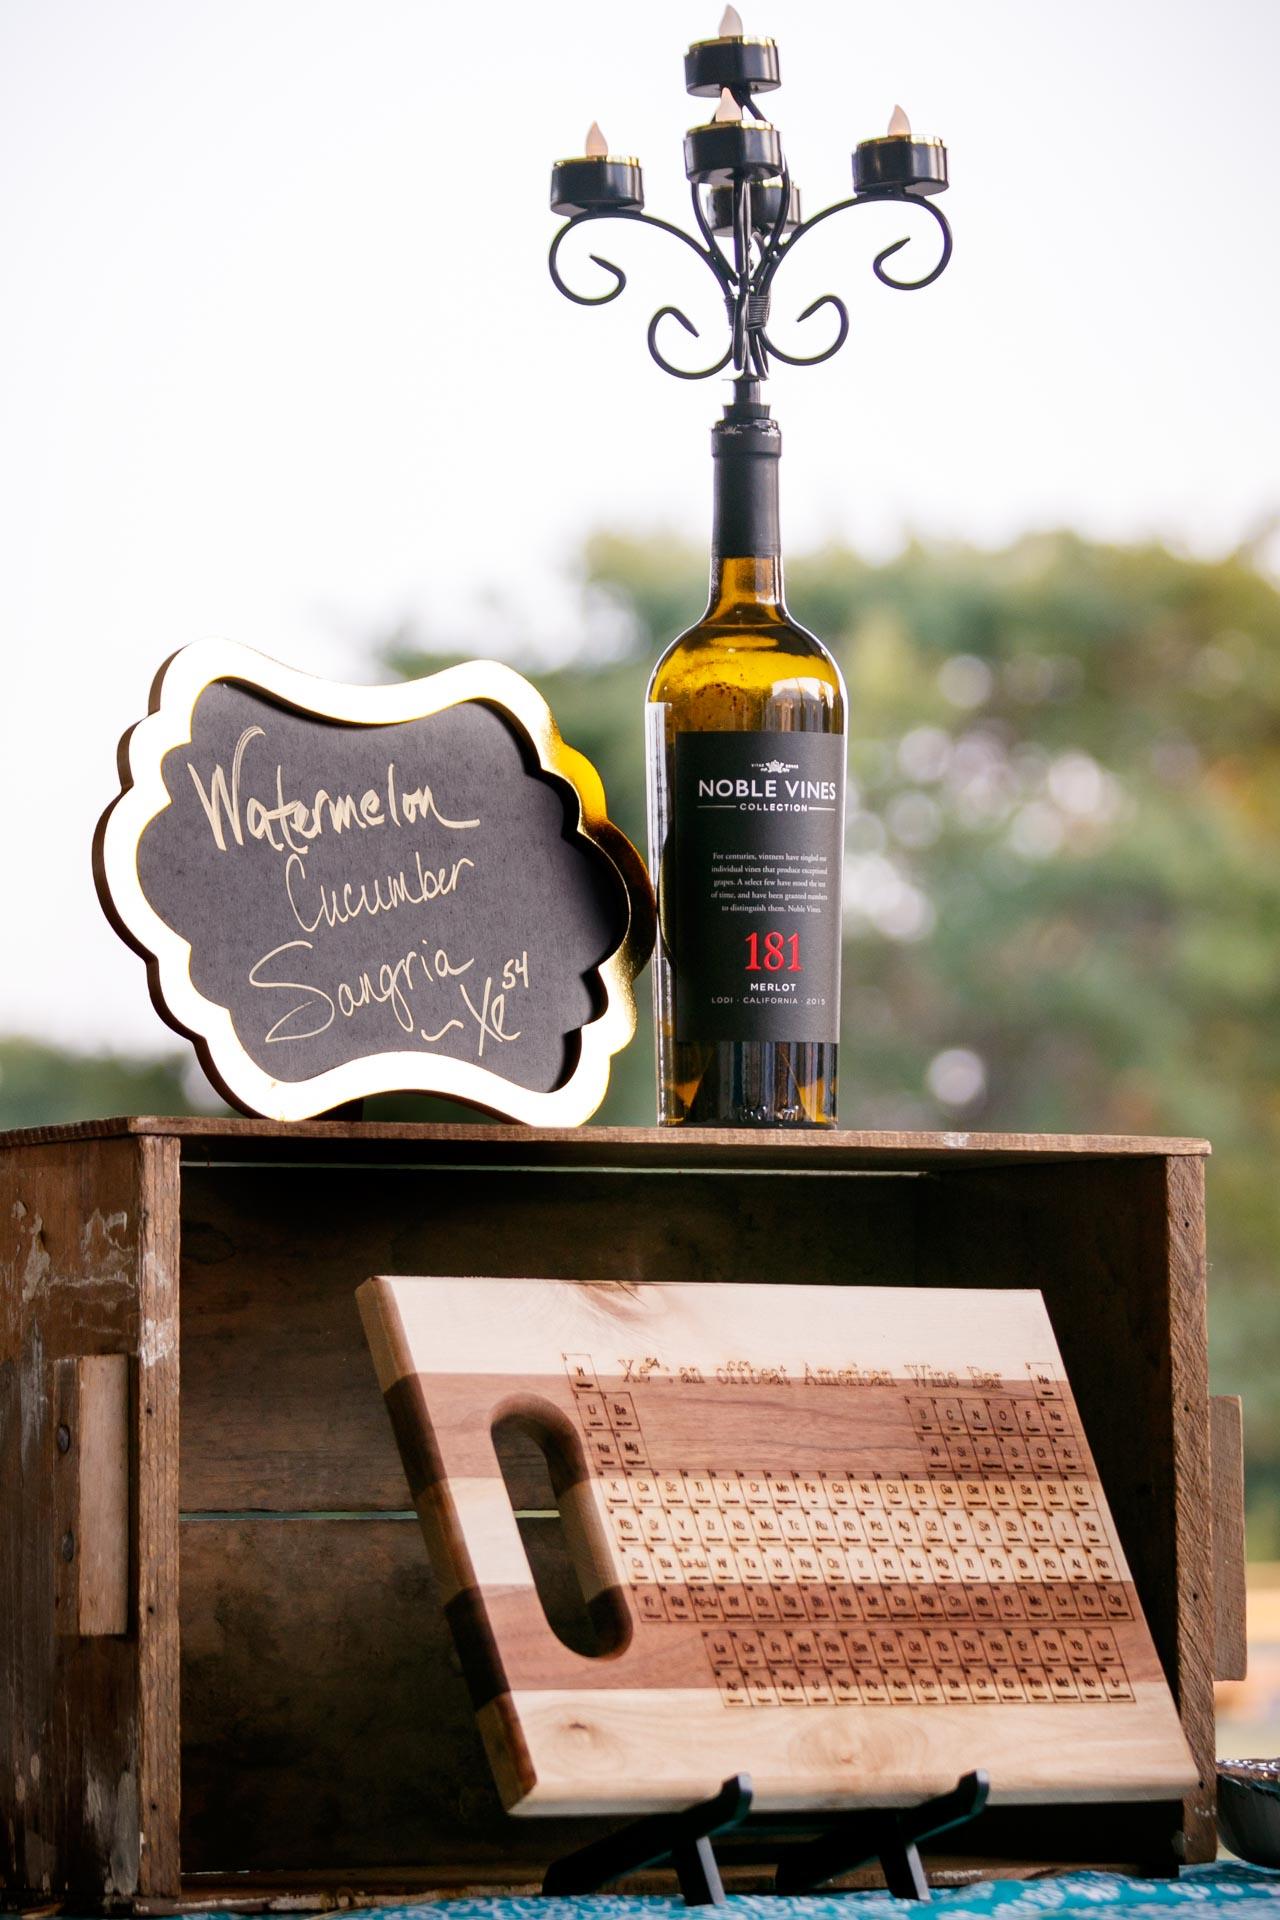 future-neenah-sunset-dinner-farm-to-table-adam-shea-photography-green-bay-appleton-neenah-photographer-10.jpg